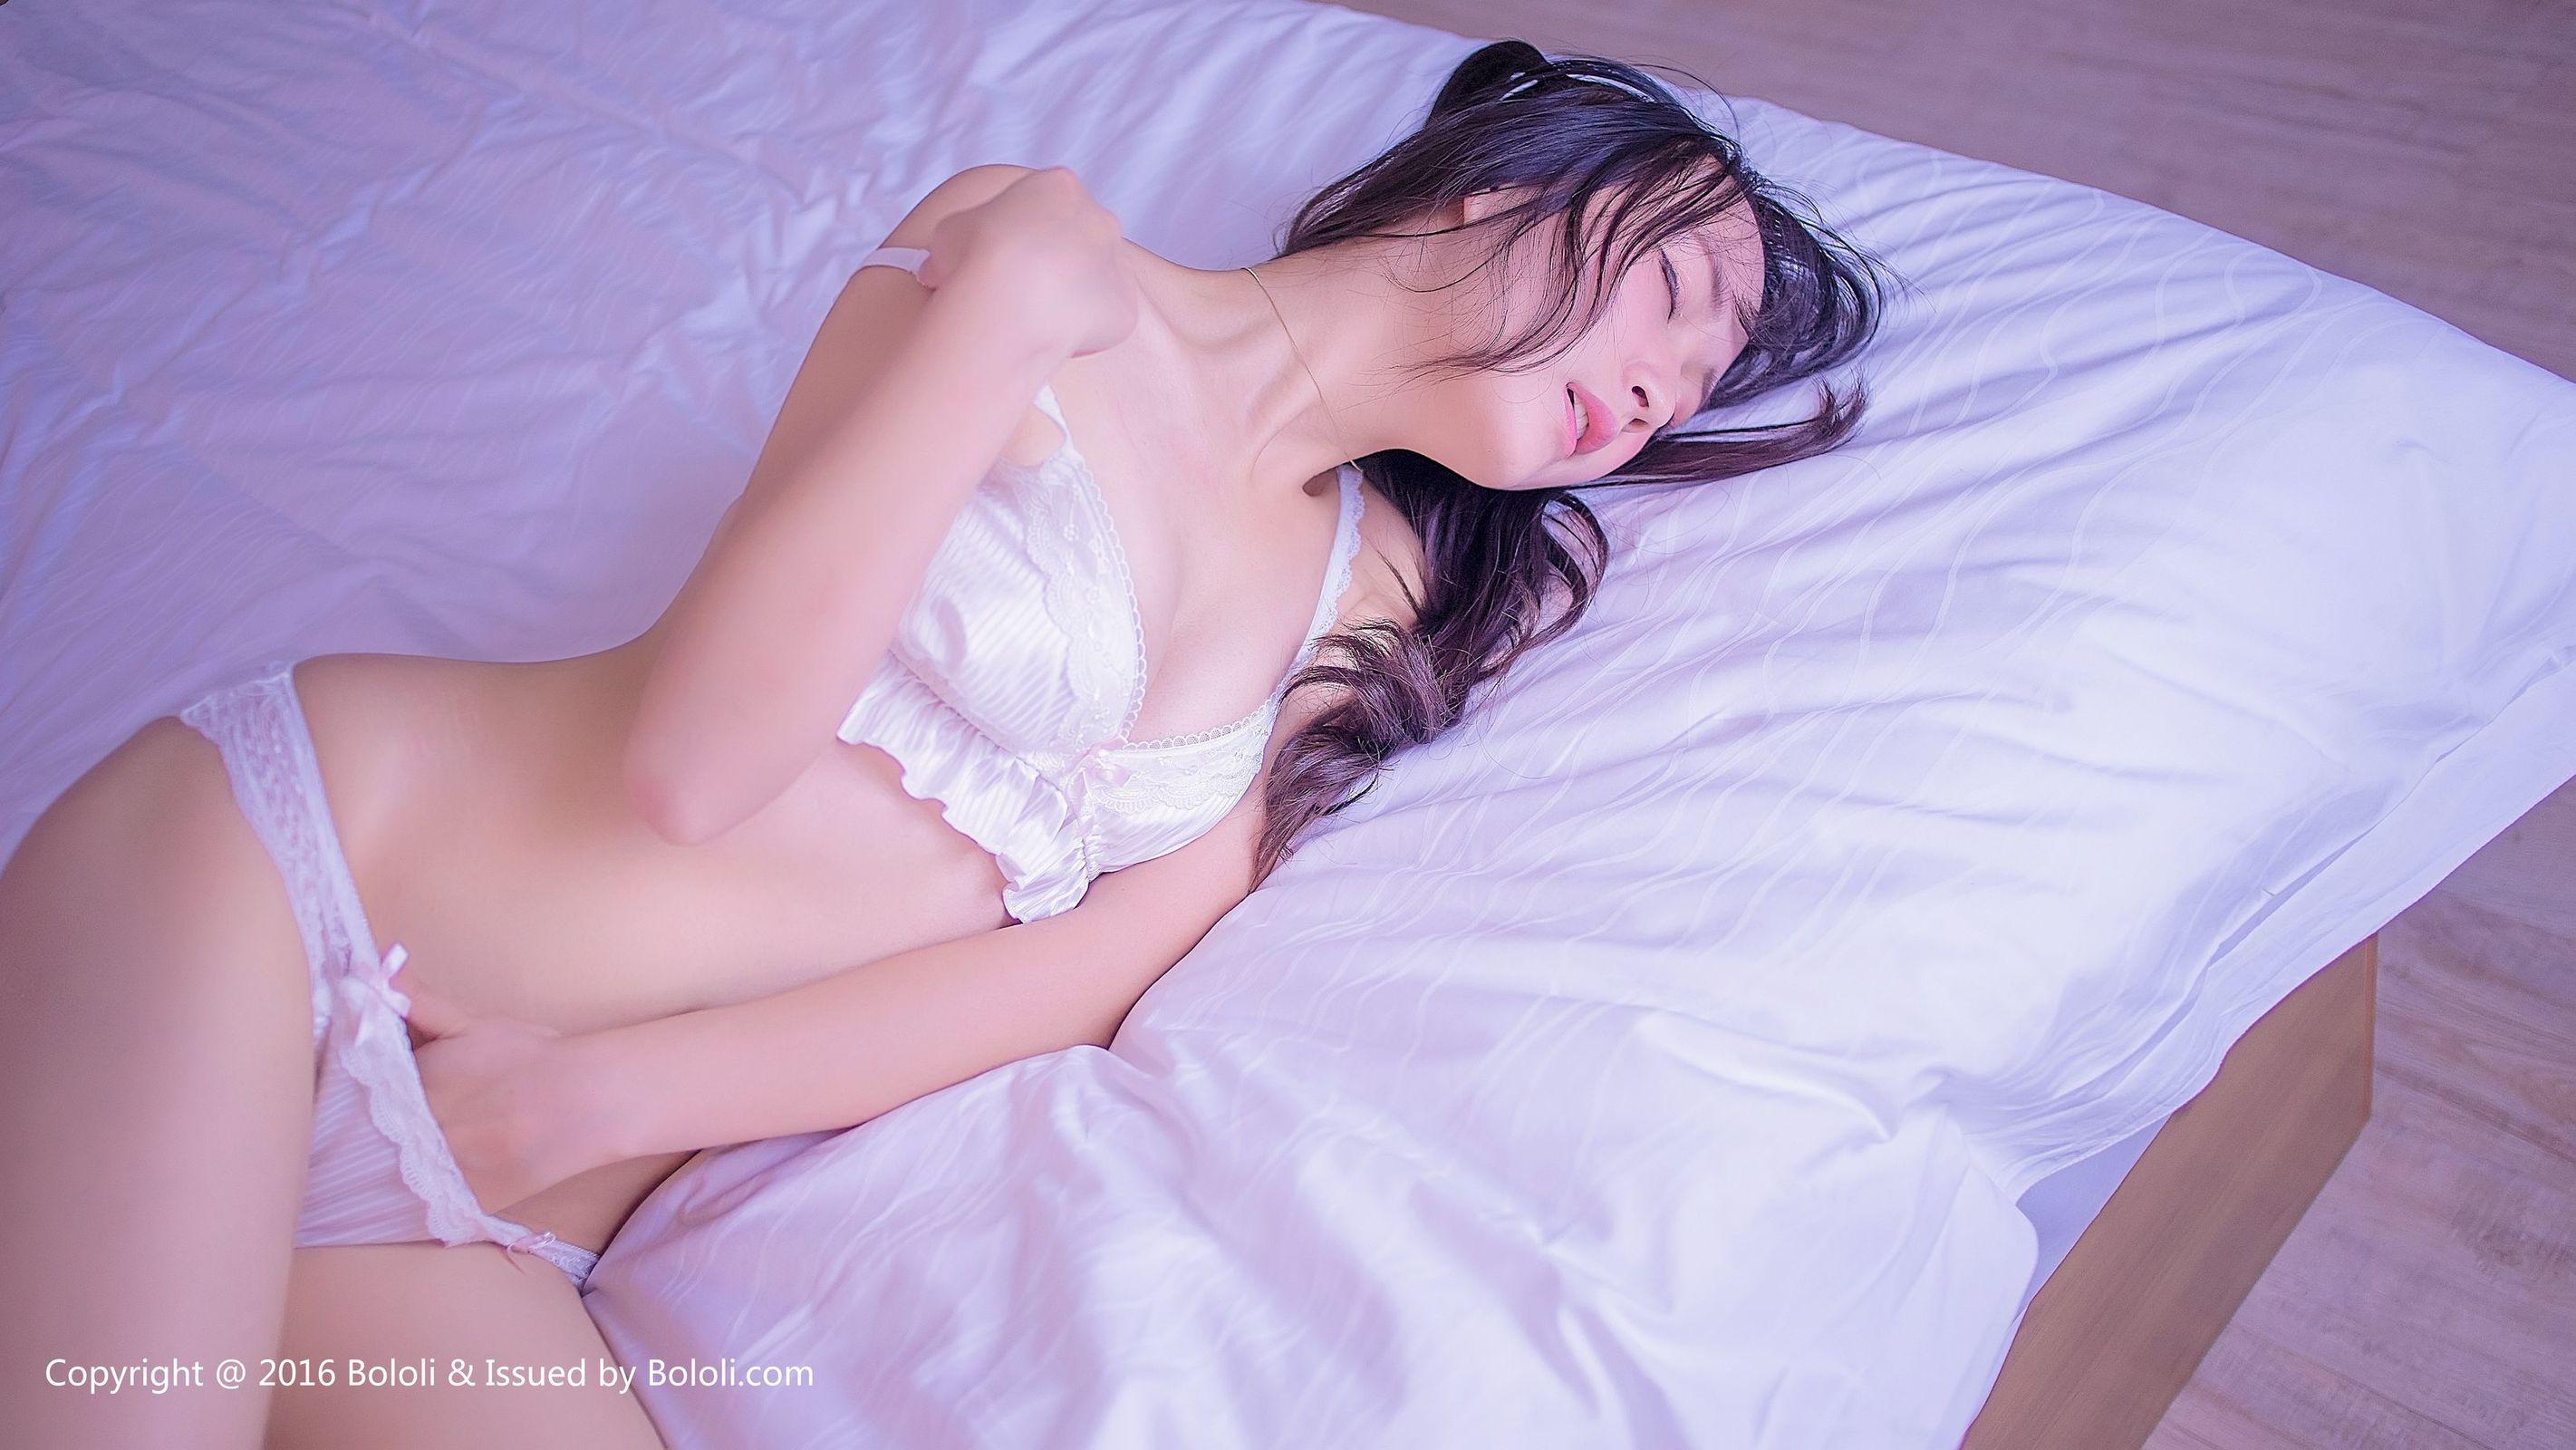 [Bololi波萝社] BOL.081 打嗝兔 - 萌系萝莉[49P]